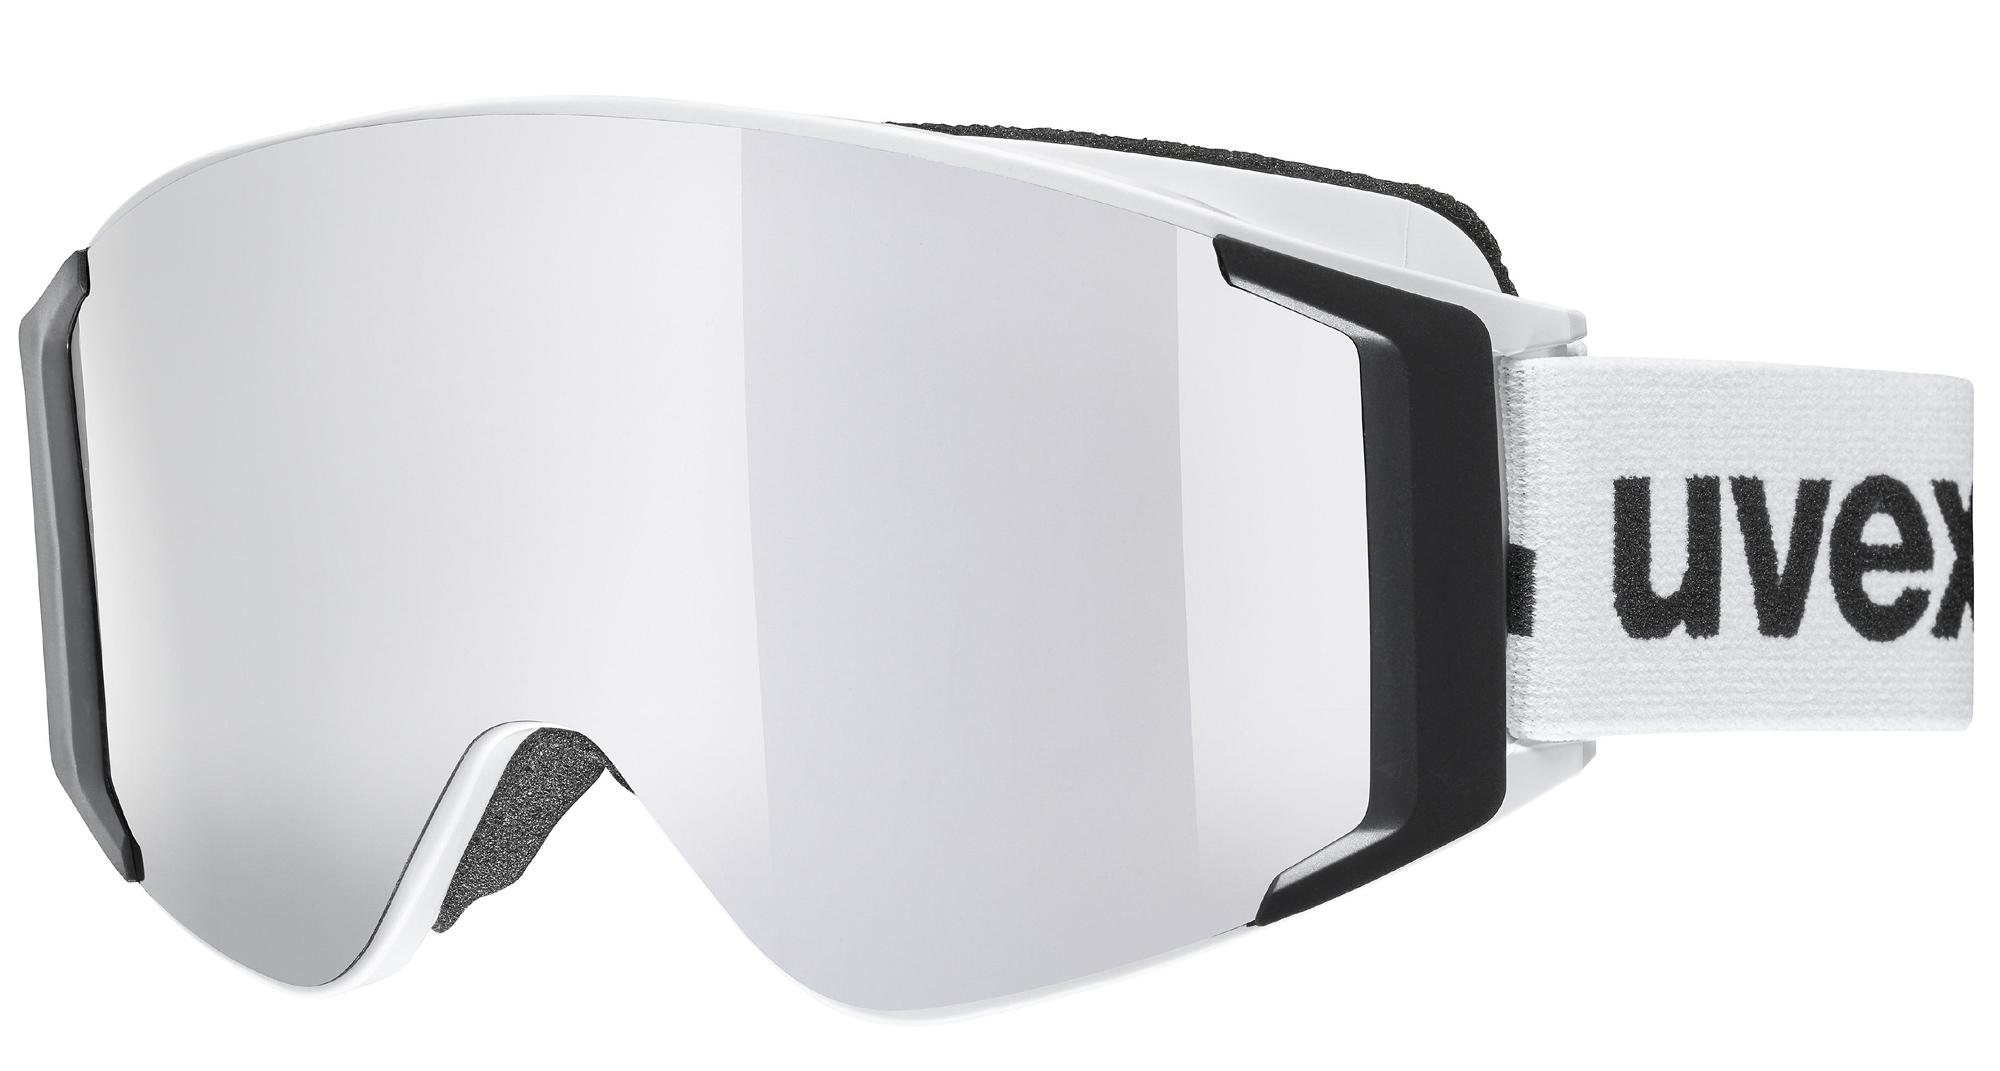 uvex-g-gl-3000-take-off-polavision-brillentr-auml-gerbrille-farbe-1030-wei-szlig-mirror-silver-p, 114.90 EUR @ sportolino-de